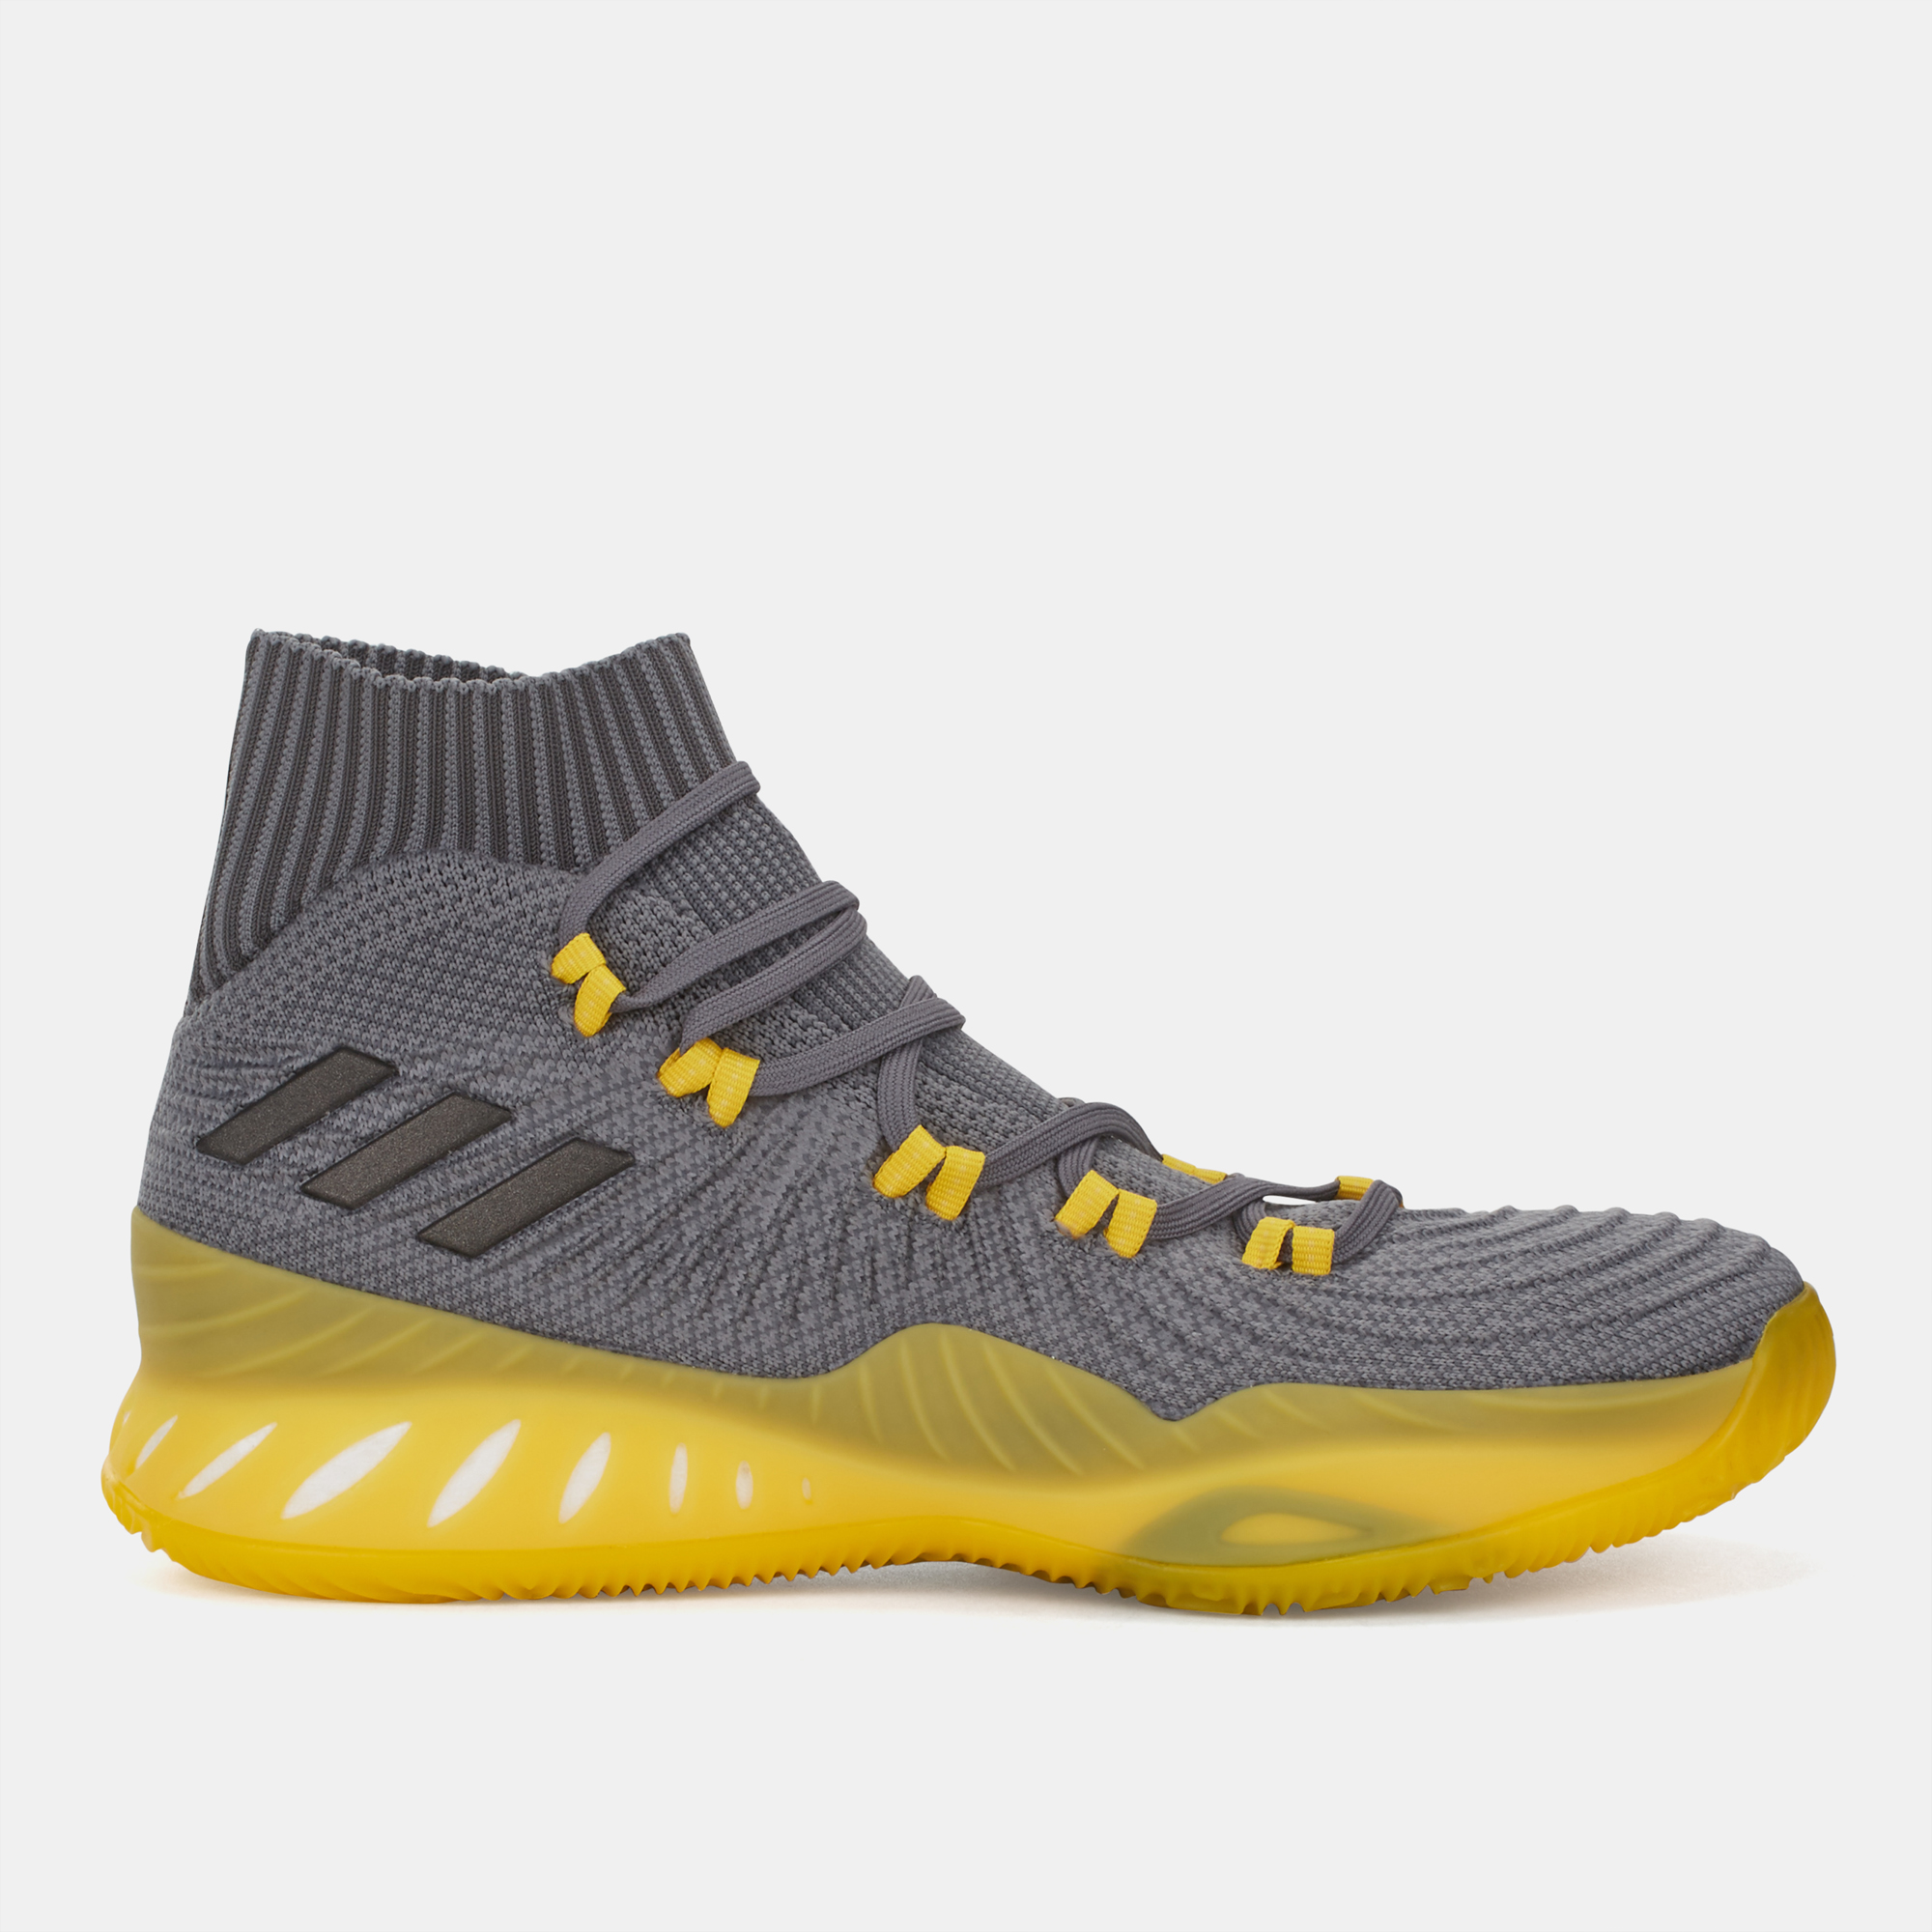 a072d4c59c278 Shop Grey adidas Crazy Explosive 2017 Primeknit Basketball Shoe for ...